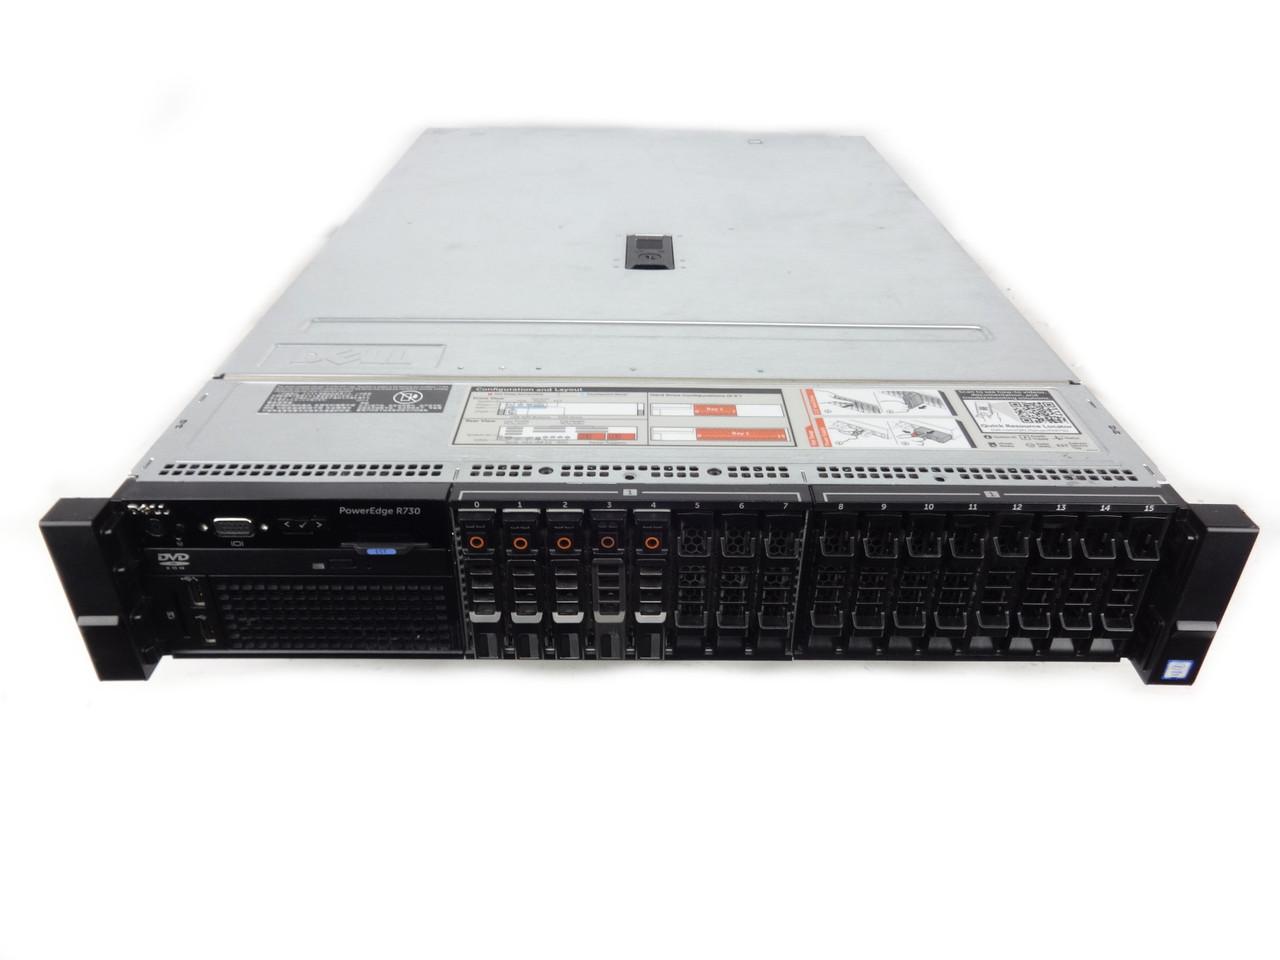 Dell Poweredge R730 16 Bay Server